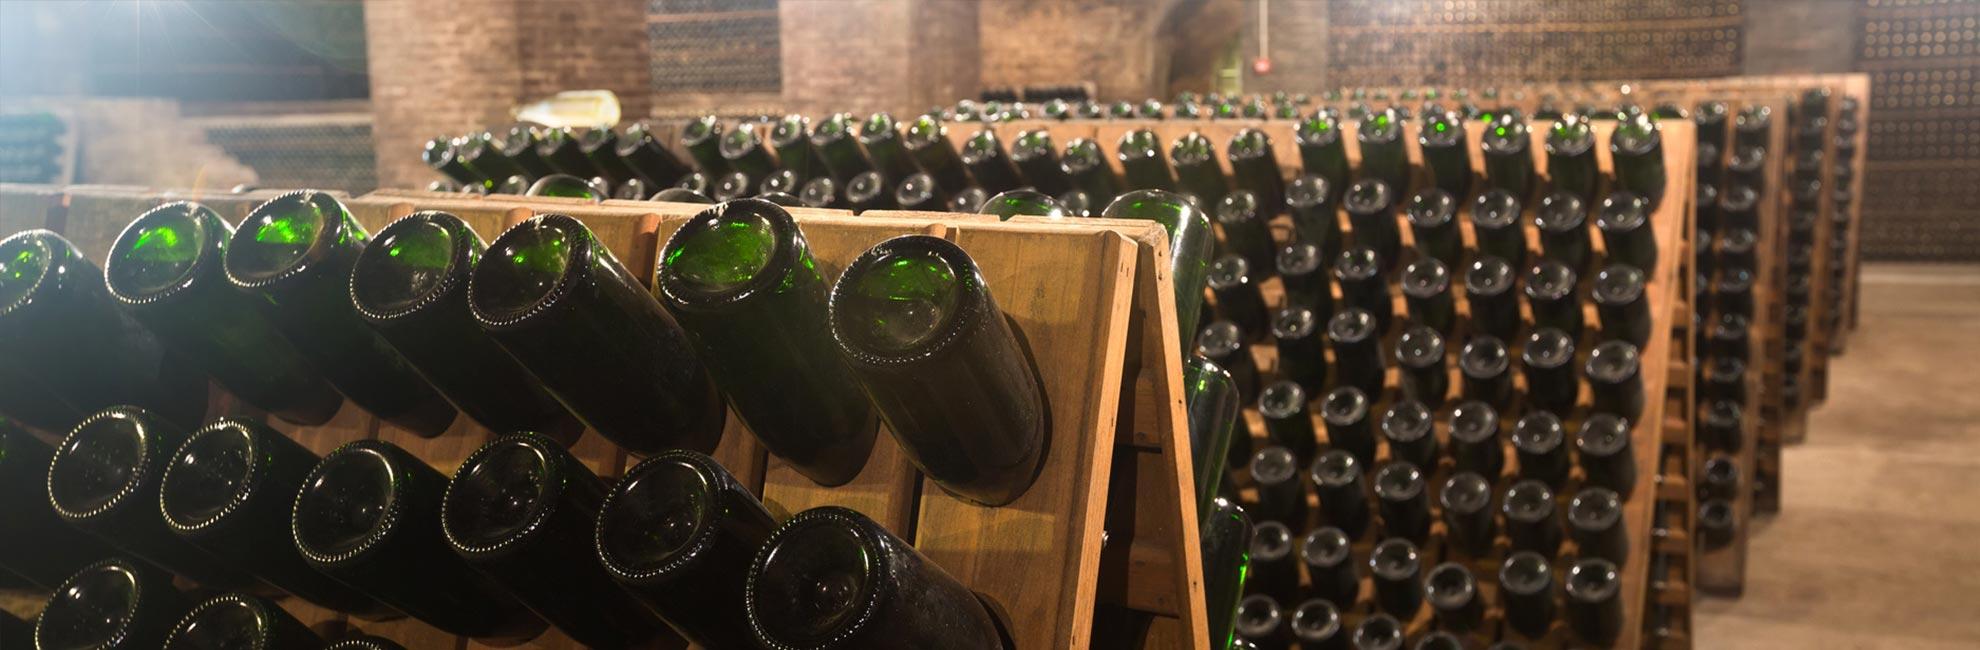 botellas-bodega-vino